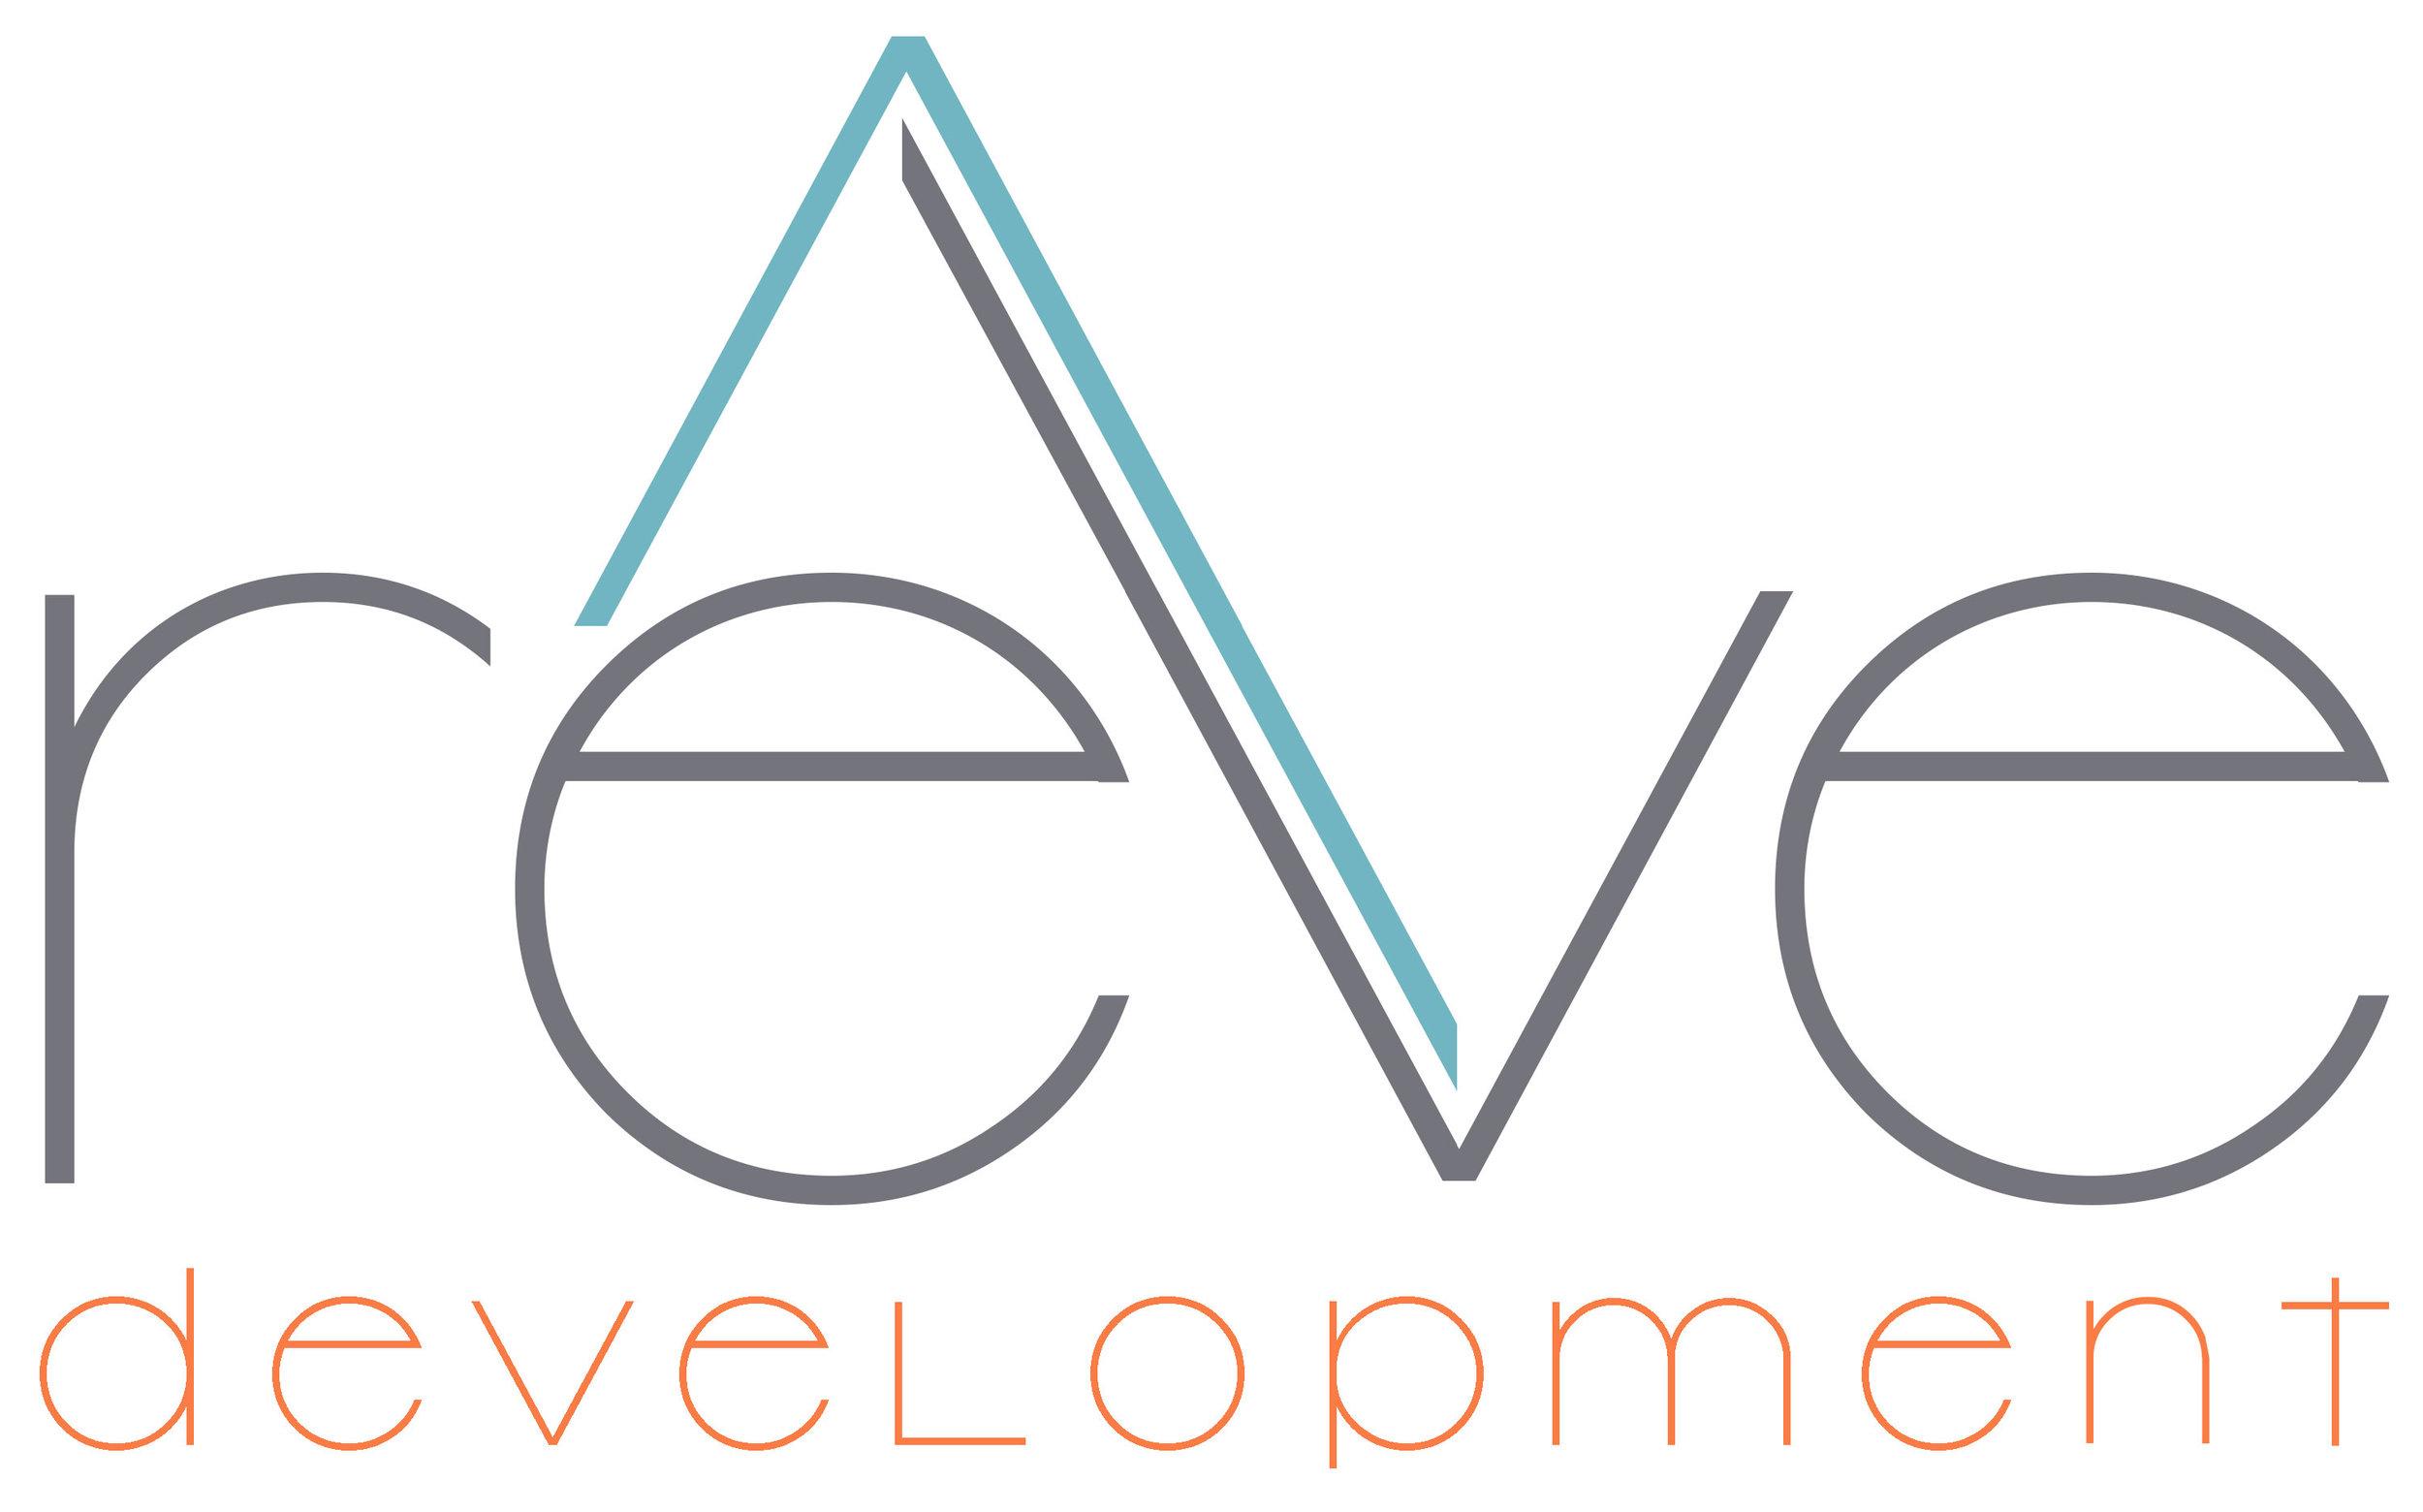 reve_logo_final.jpg